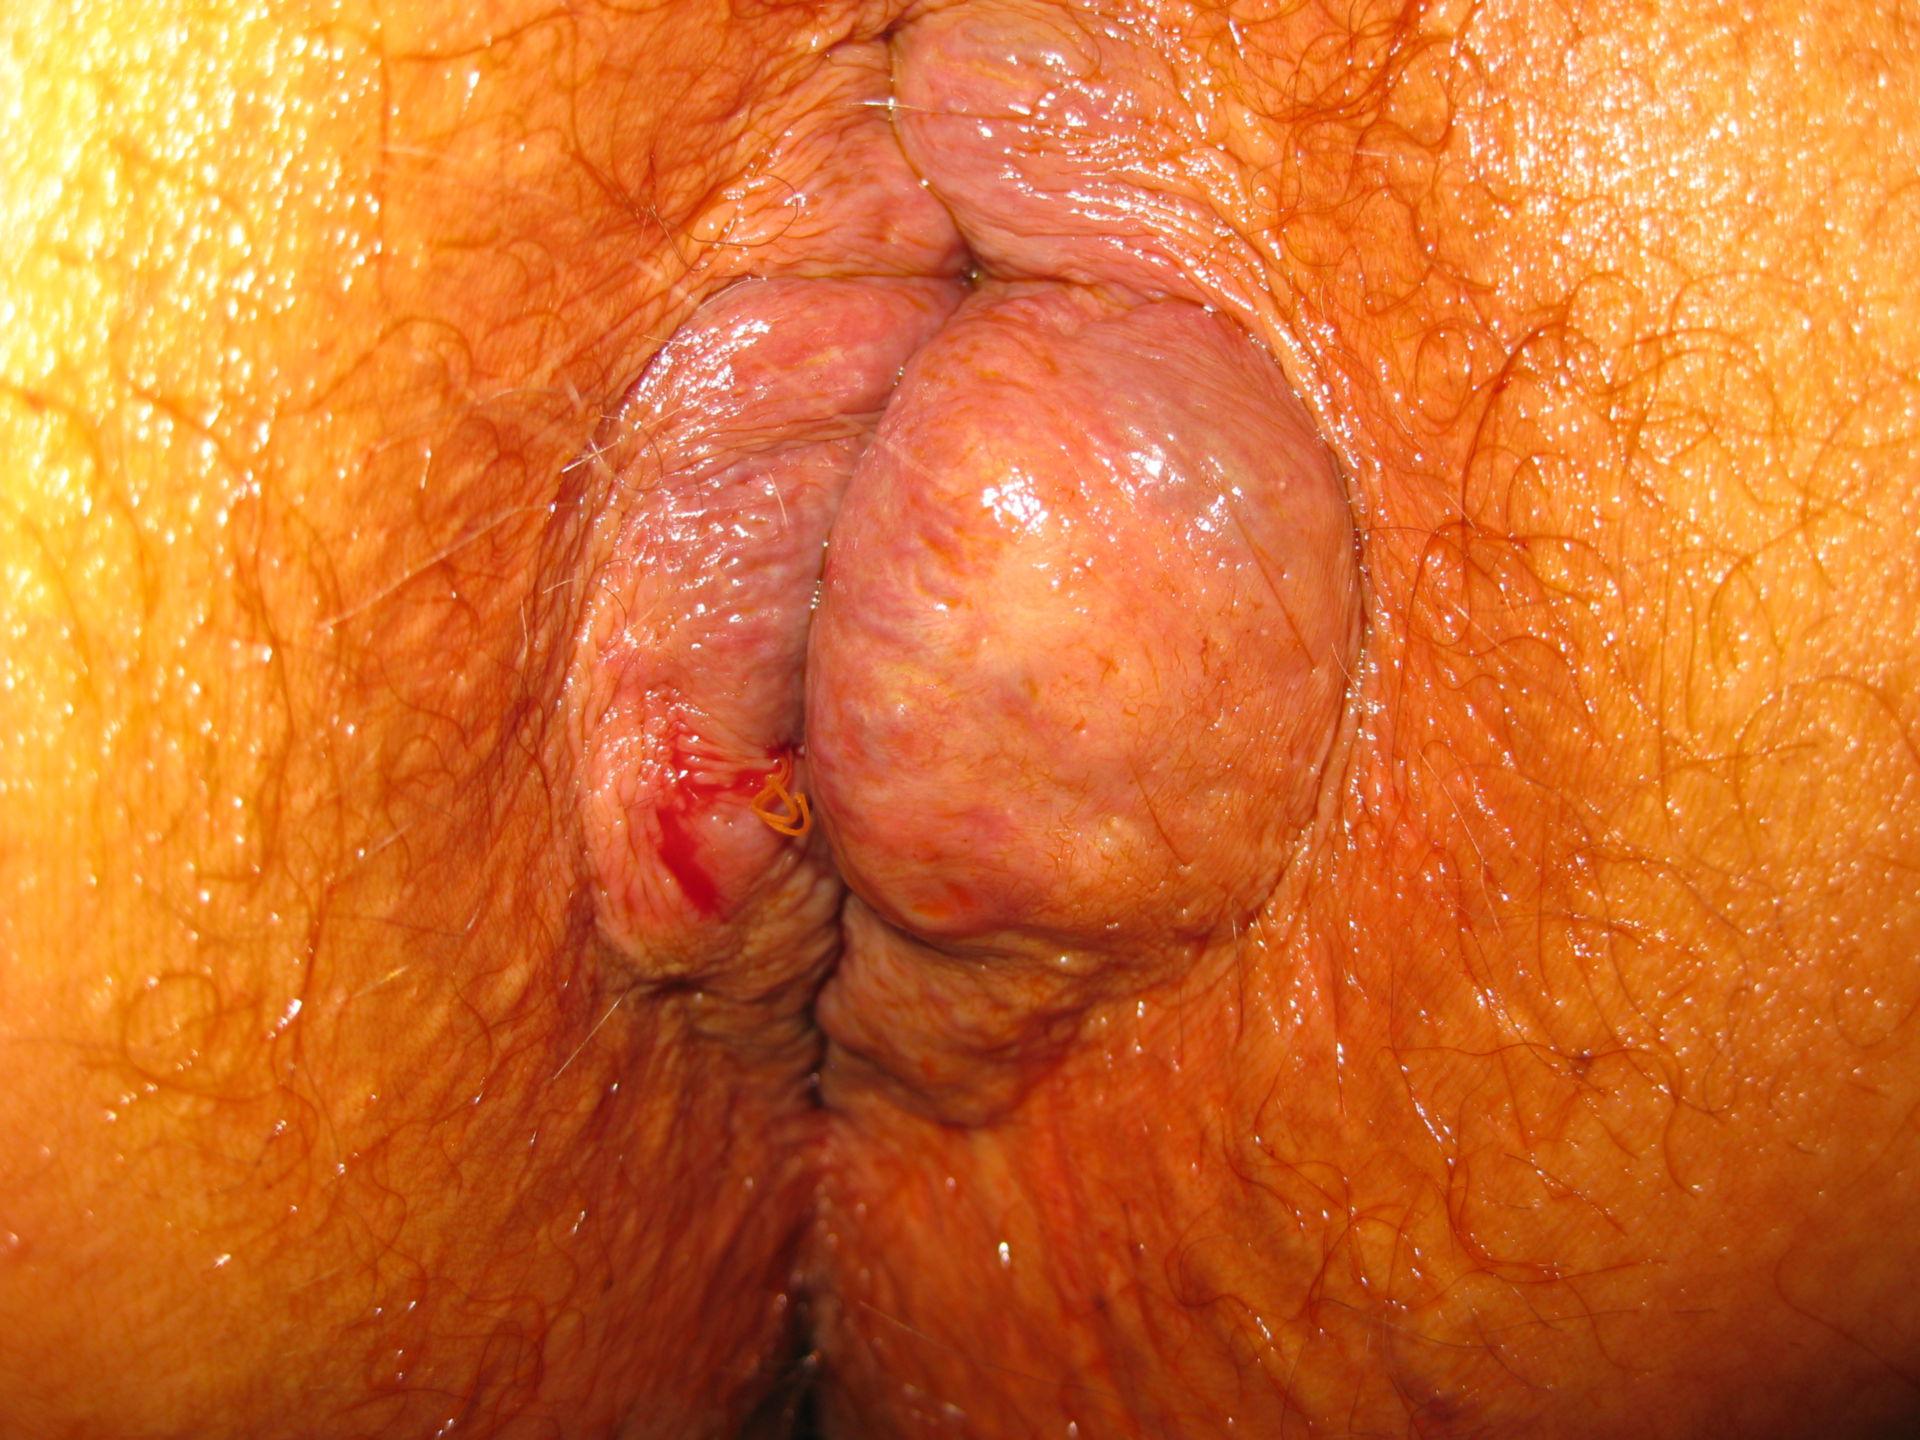 Hemorrhoids grade IV